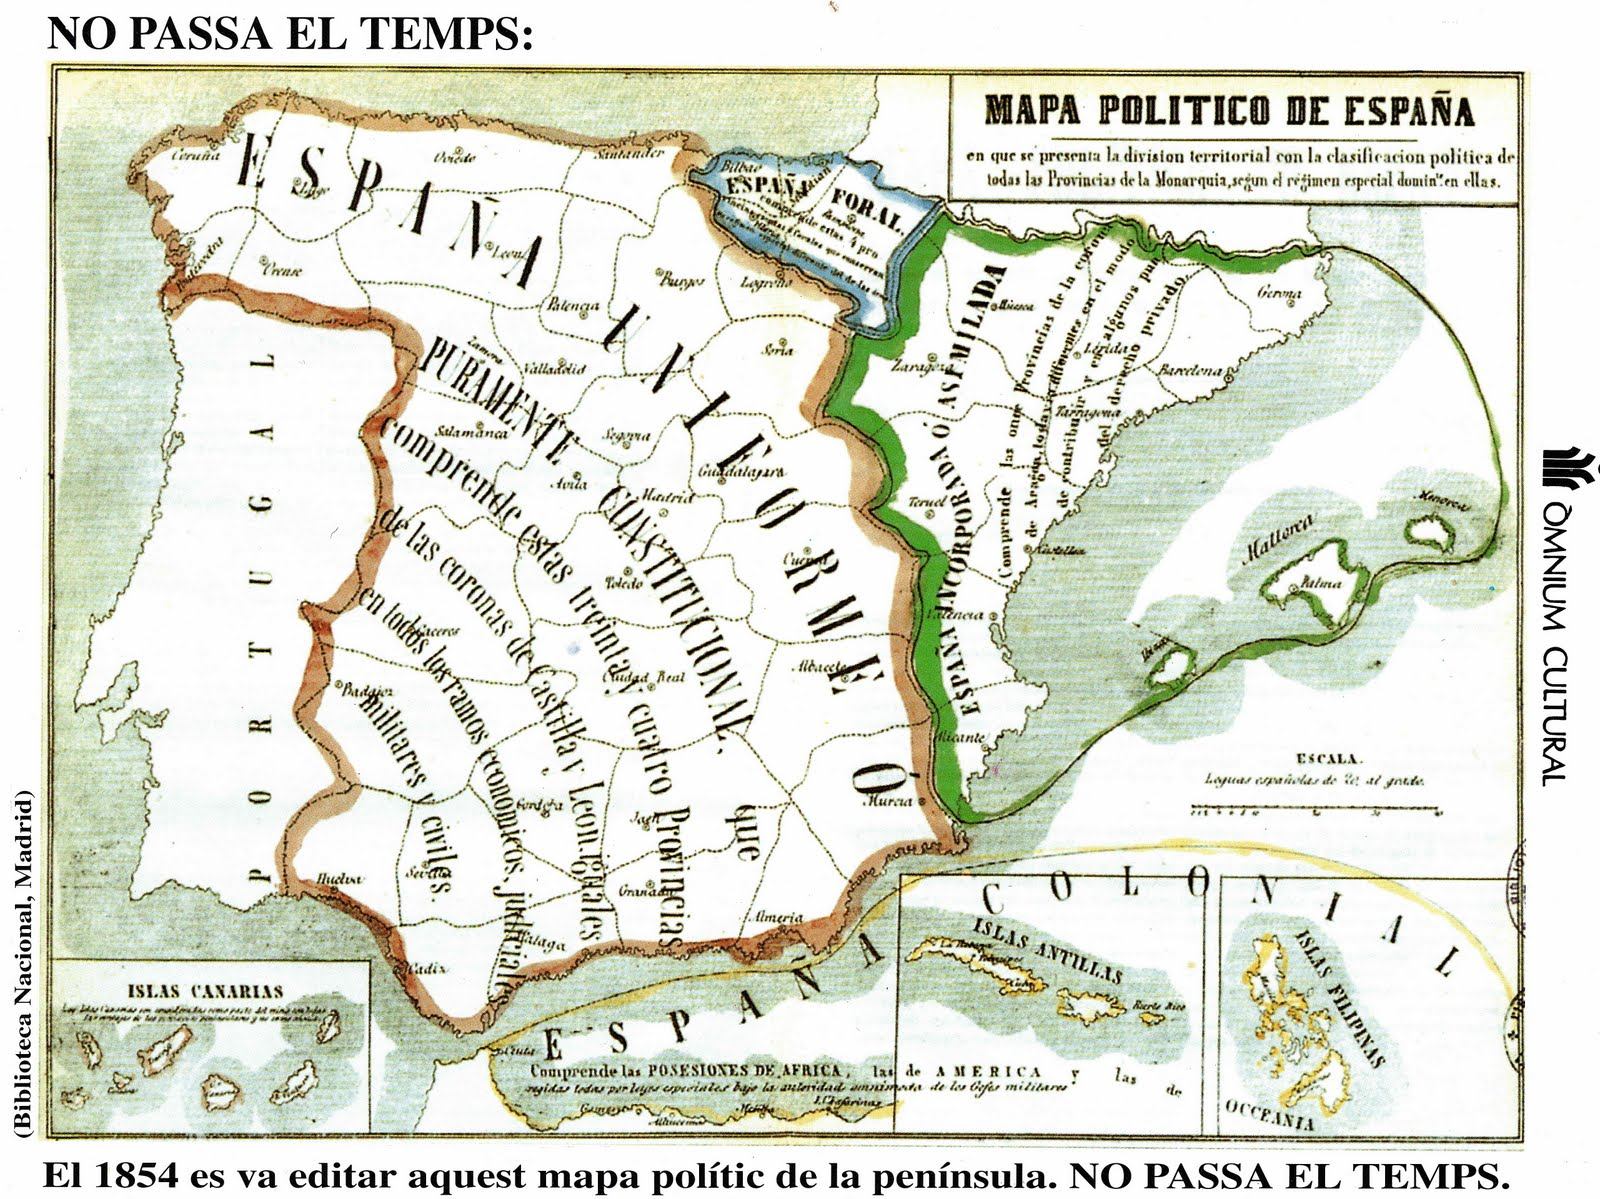 mapa-politico-espana-1854